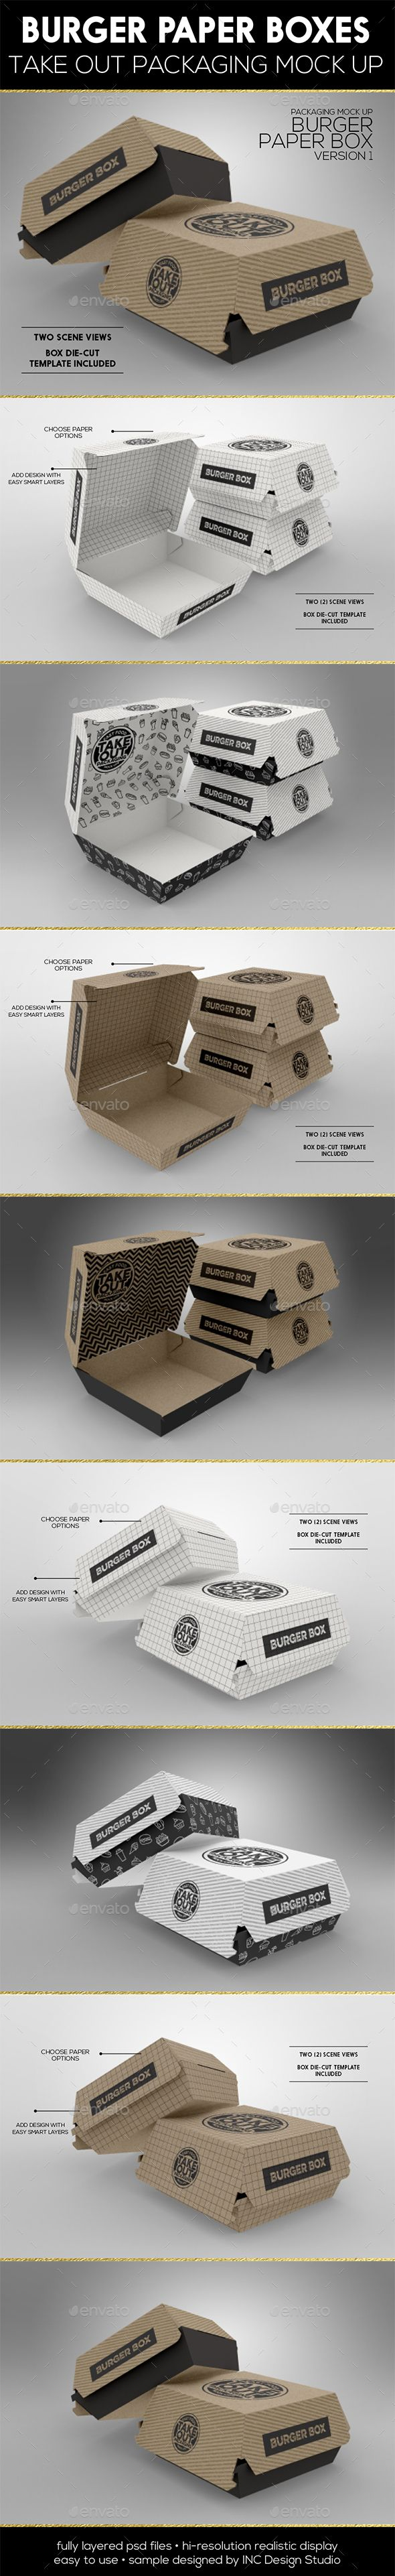 Burger Box Packaging Mock Up Download here: https://graphicriver.net/item/burger-box-packaging-mock-up/19575562?ref=KlitVogli